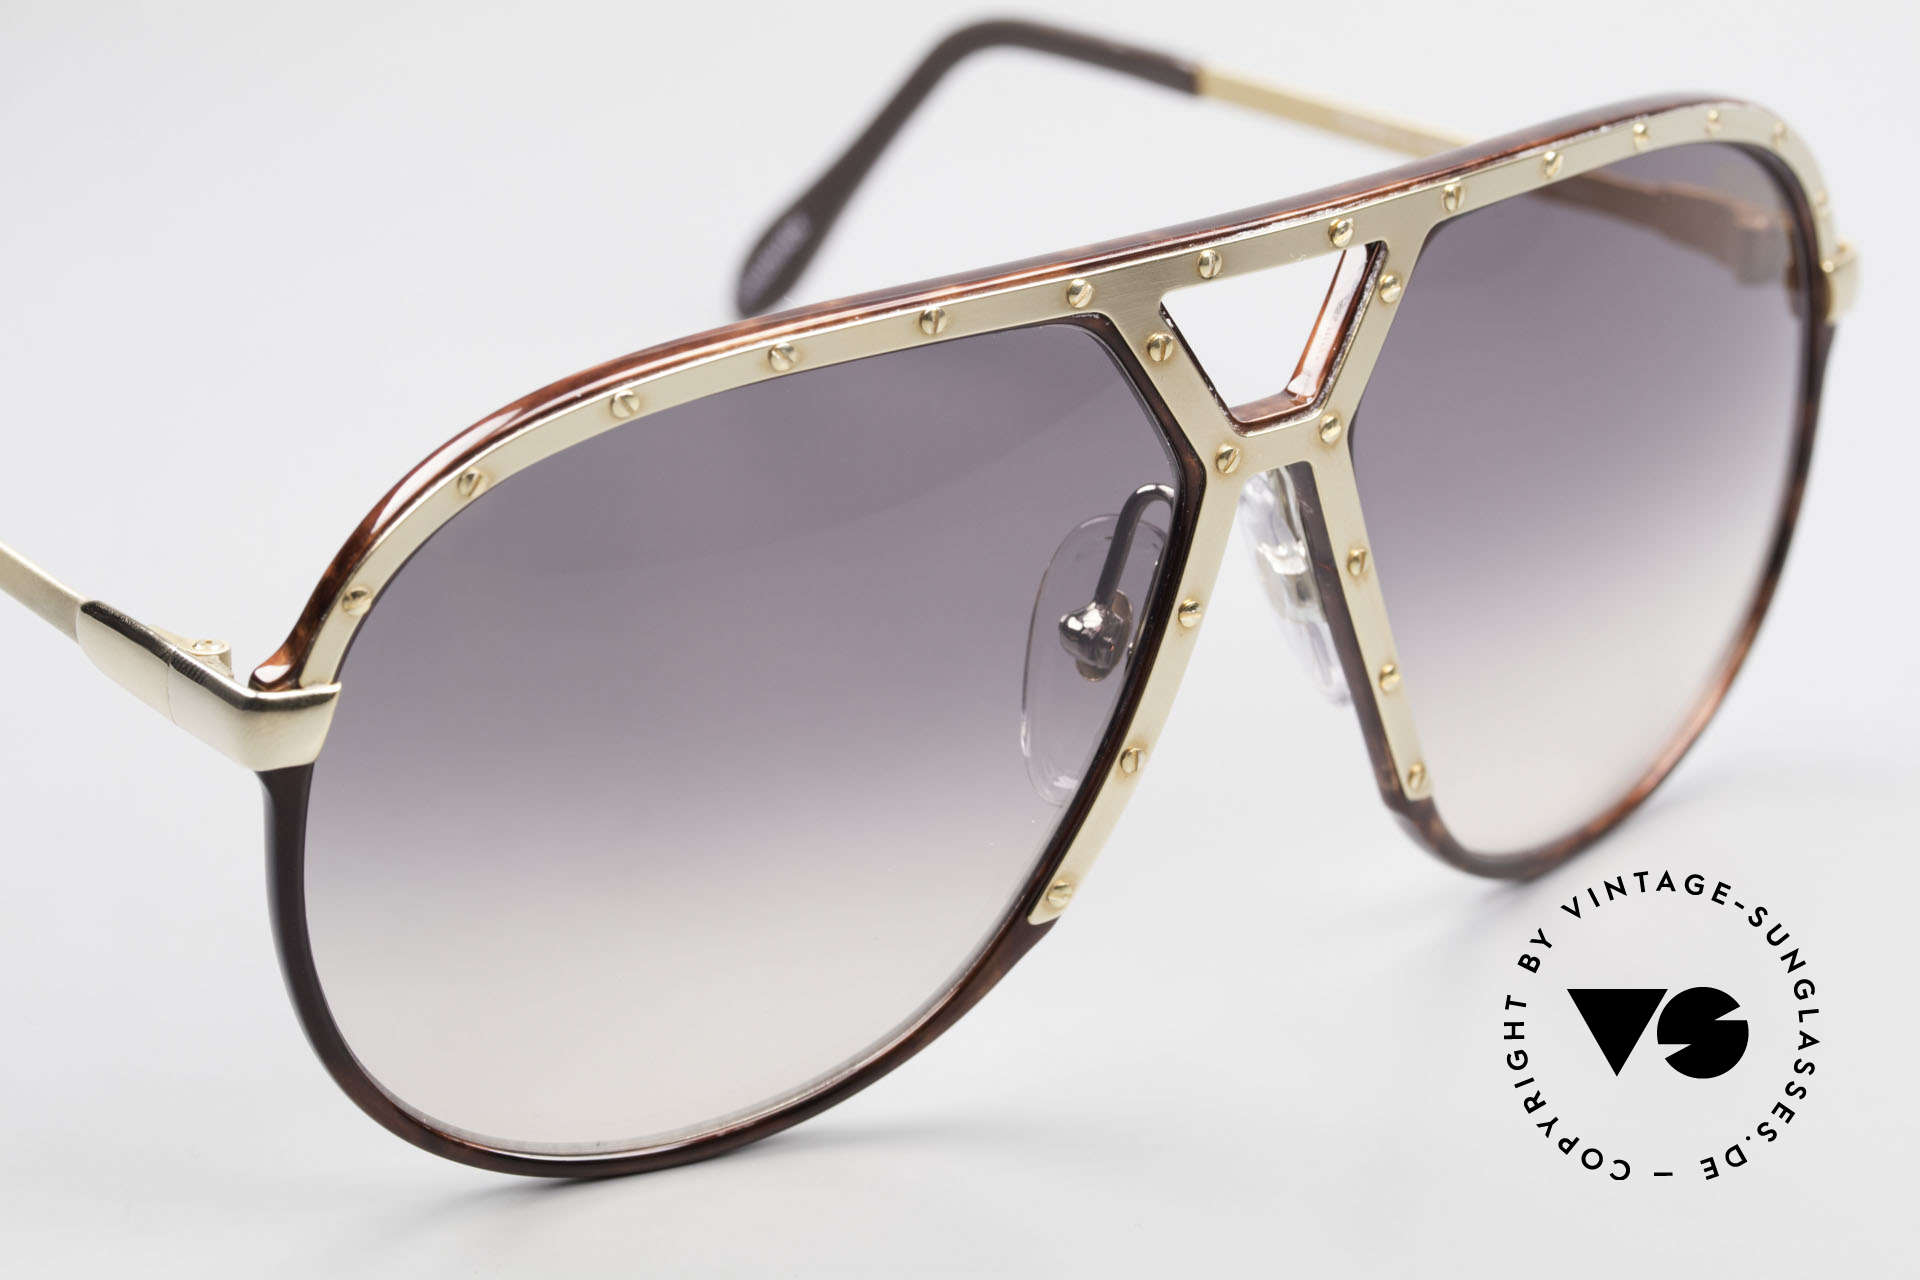 Alpina M1 Ultra Rare Aviator Sunglasses, NOS, unworn rarity: sought-after collector's item, Made for Men